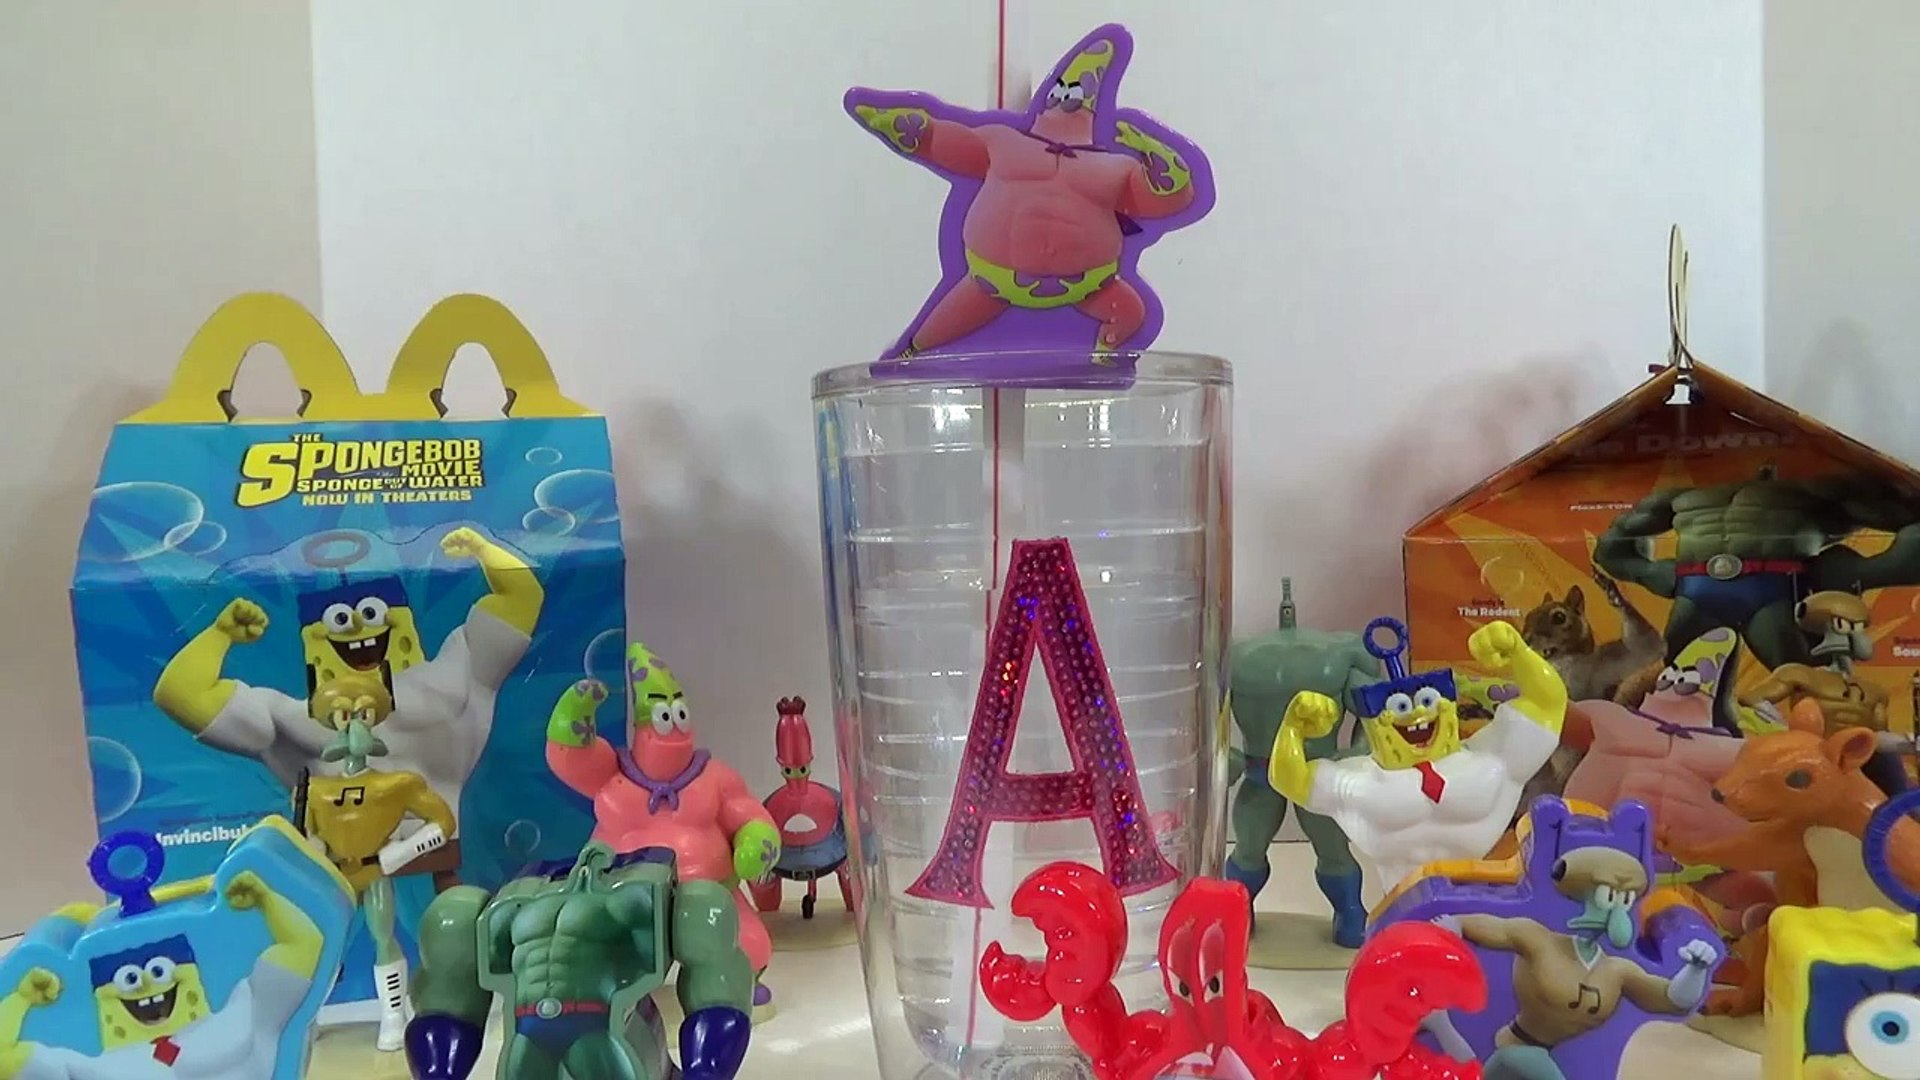 Spongebob Movie Sponge Out Of Water Mcdonalds Happy Meal Toys